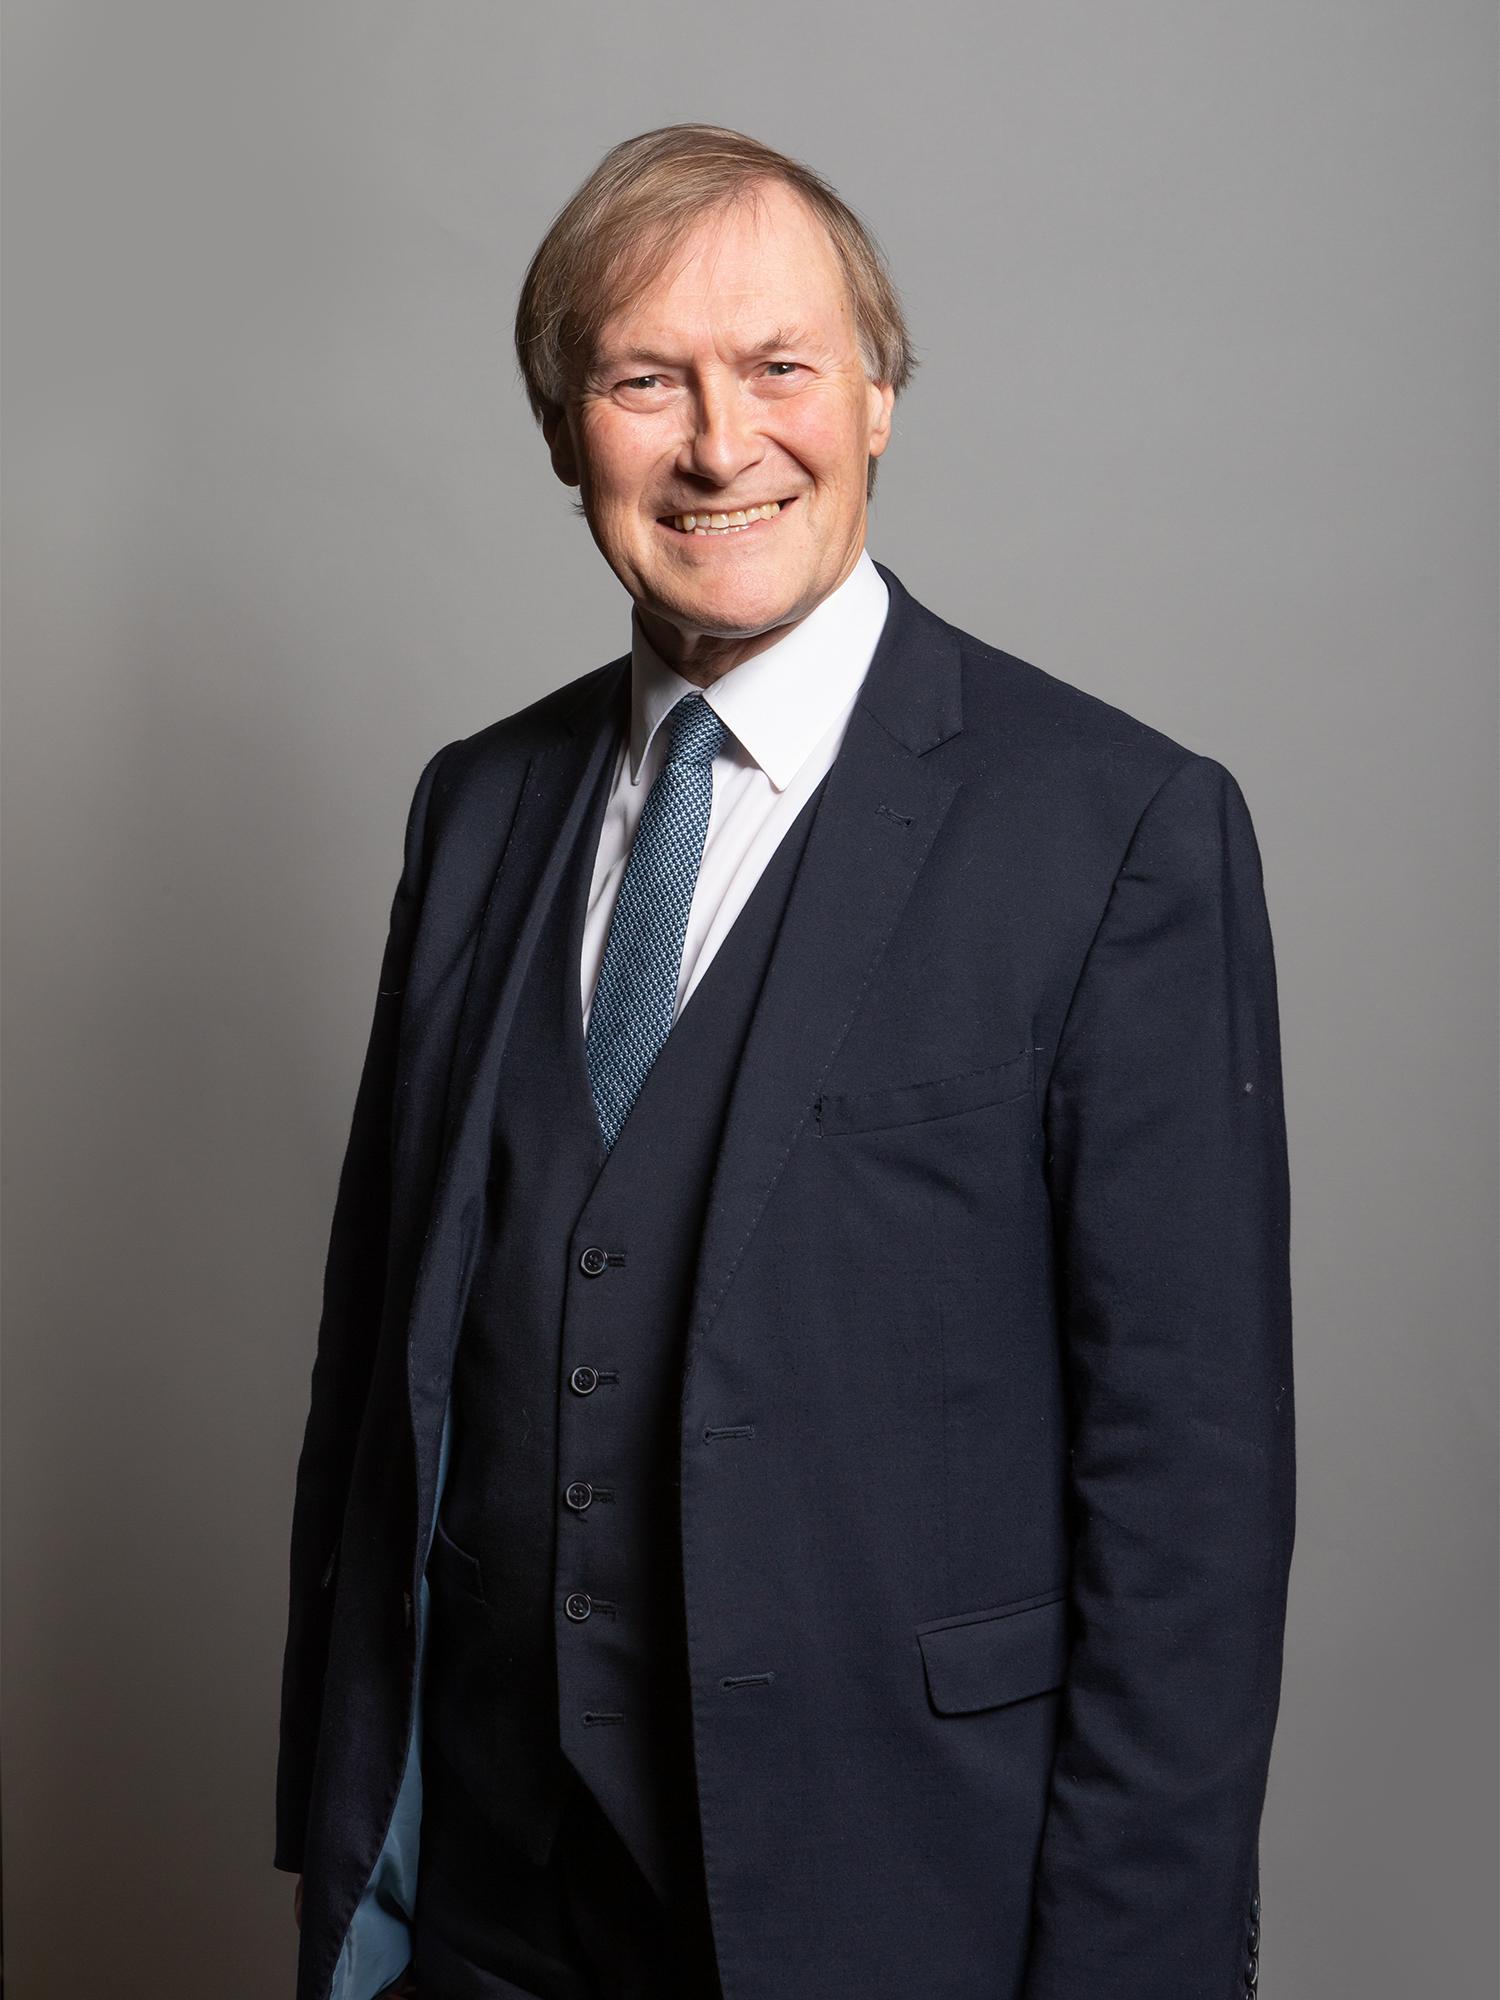 Sir David Amess RIP